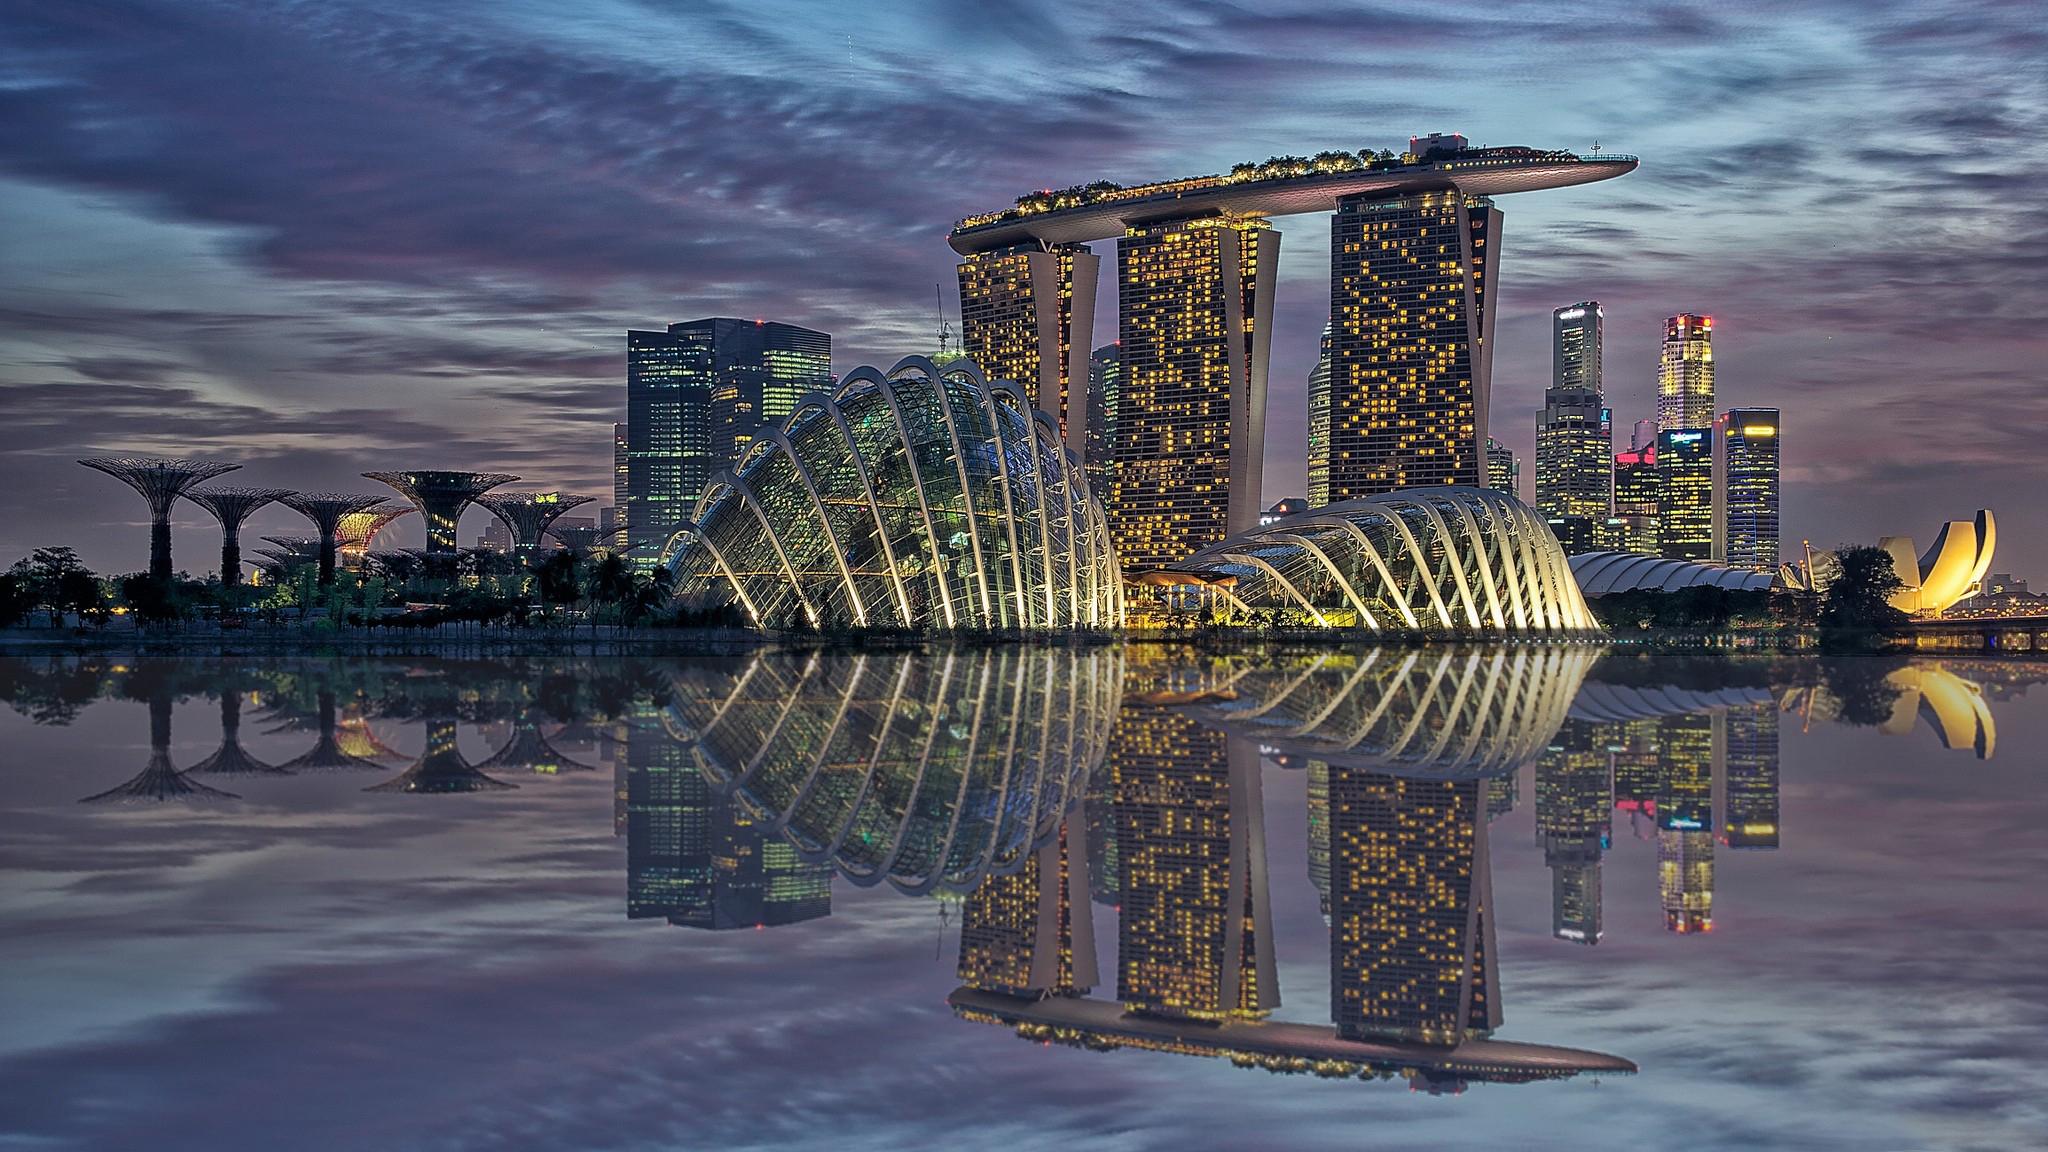 страны архитектура Сингапур ночь  № 1476030 бесплатно